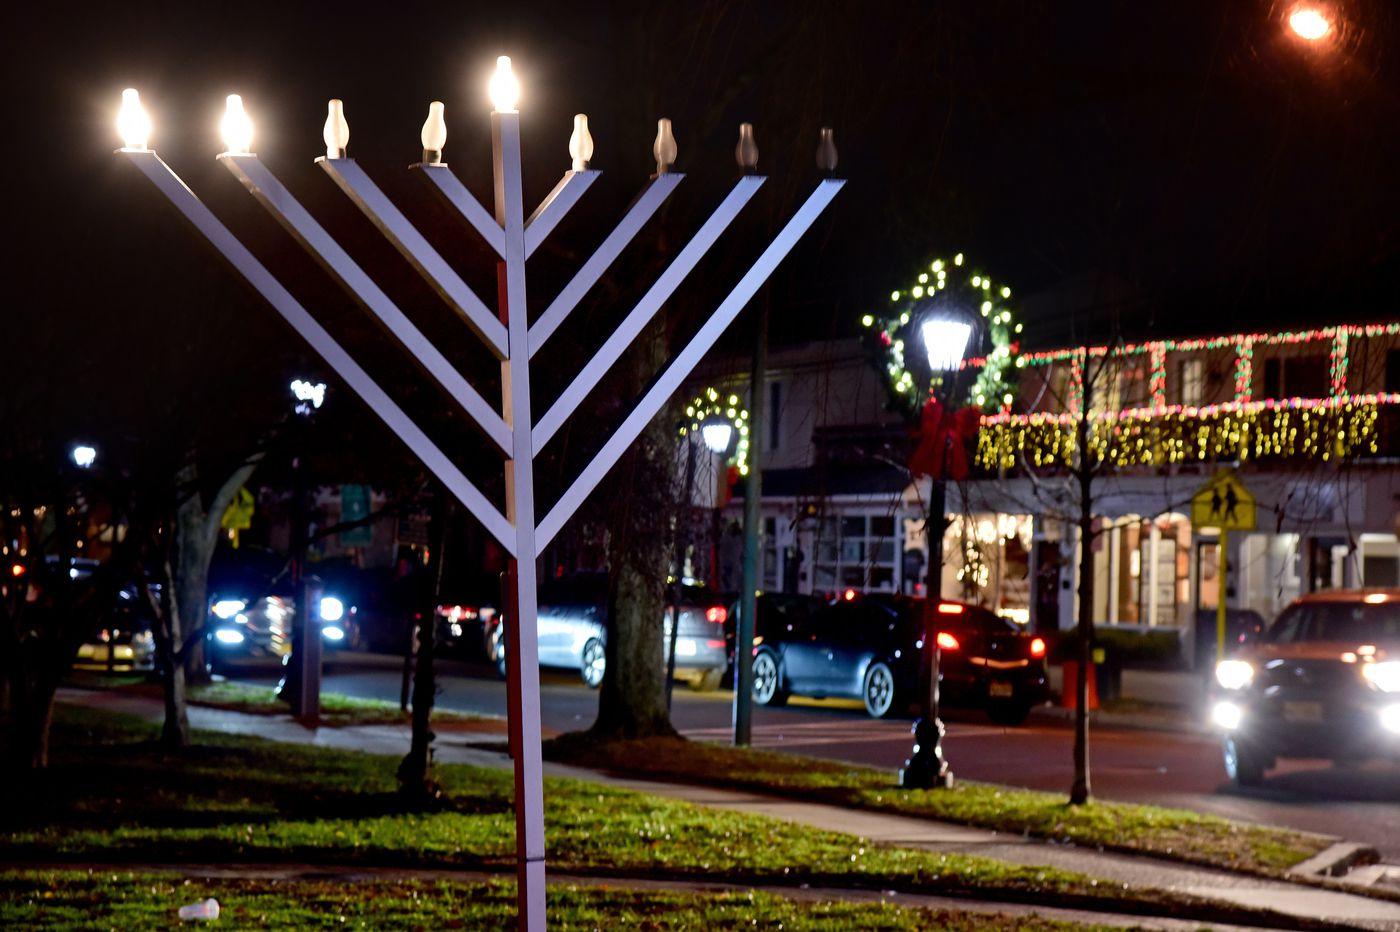 Holiday celebrations light the skies across the region